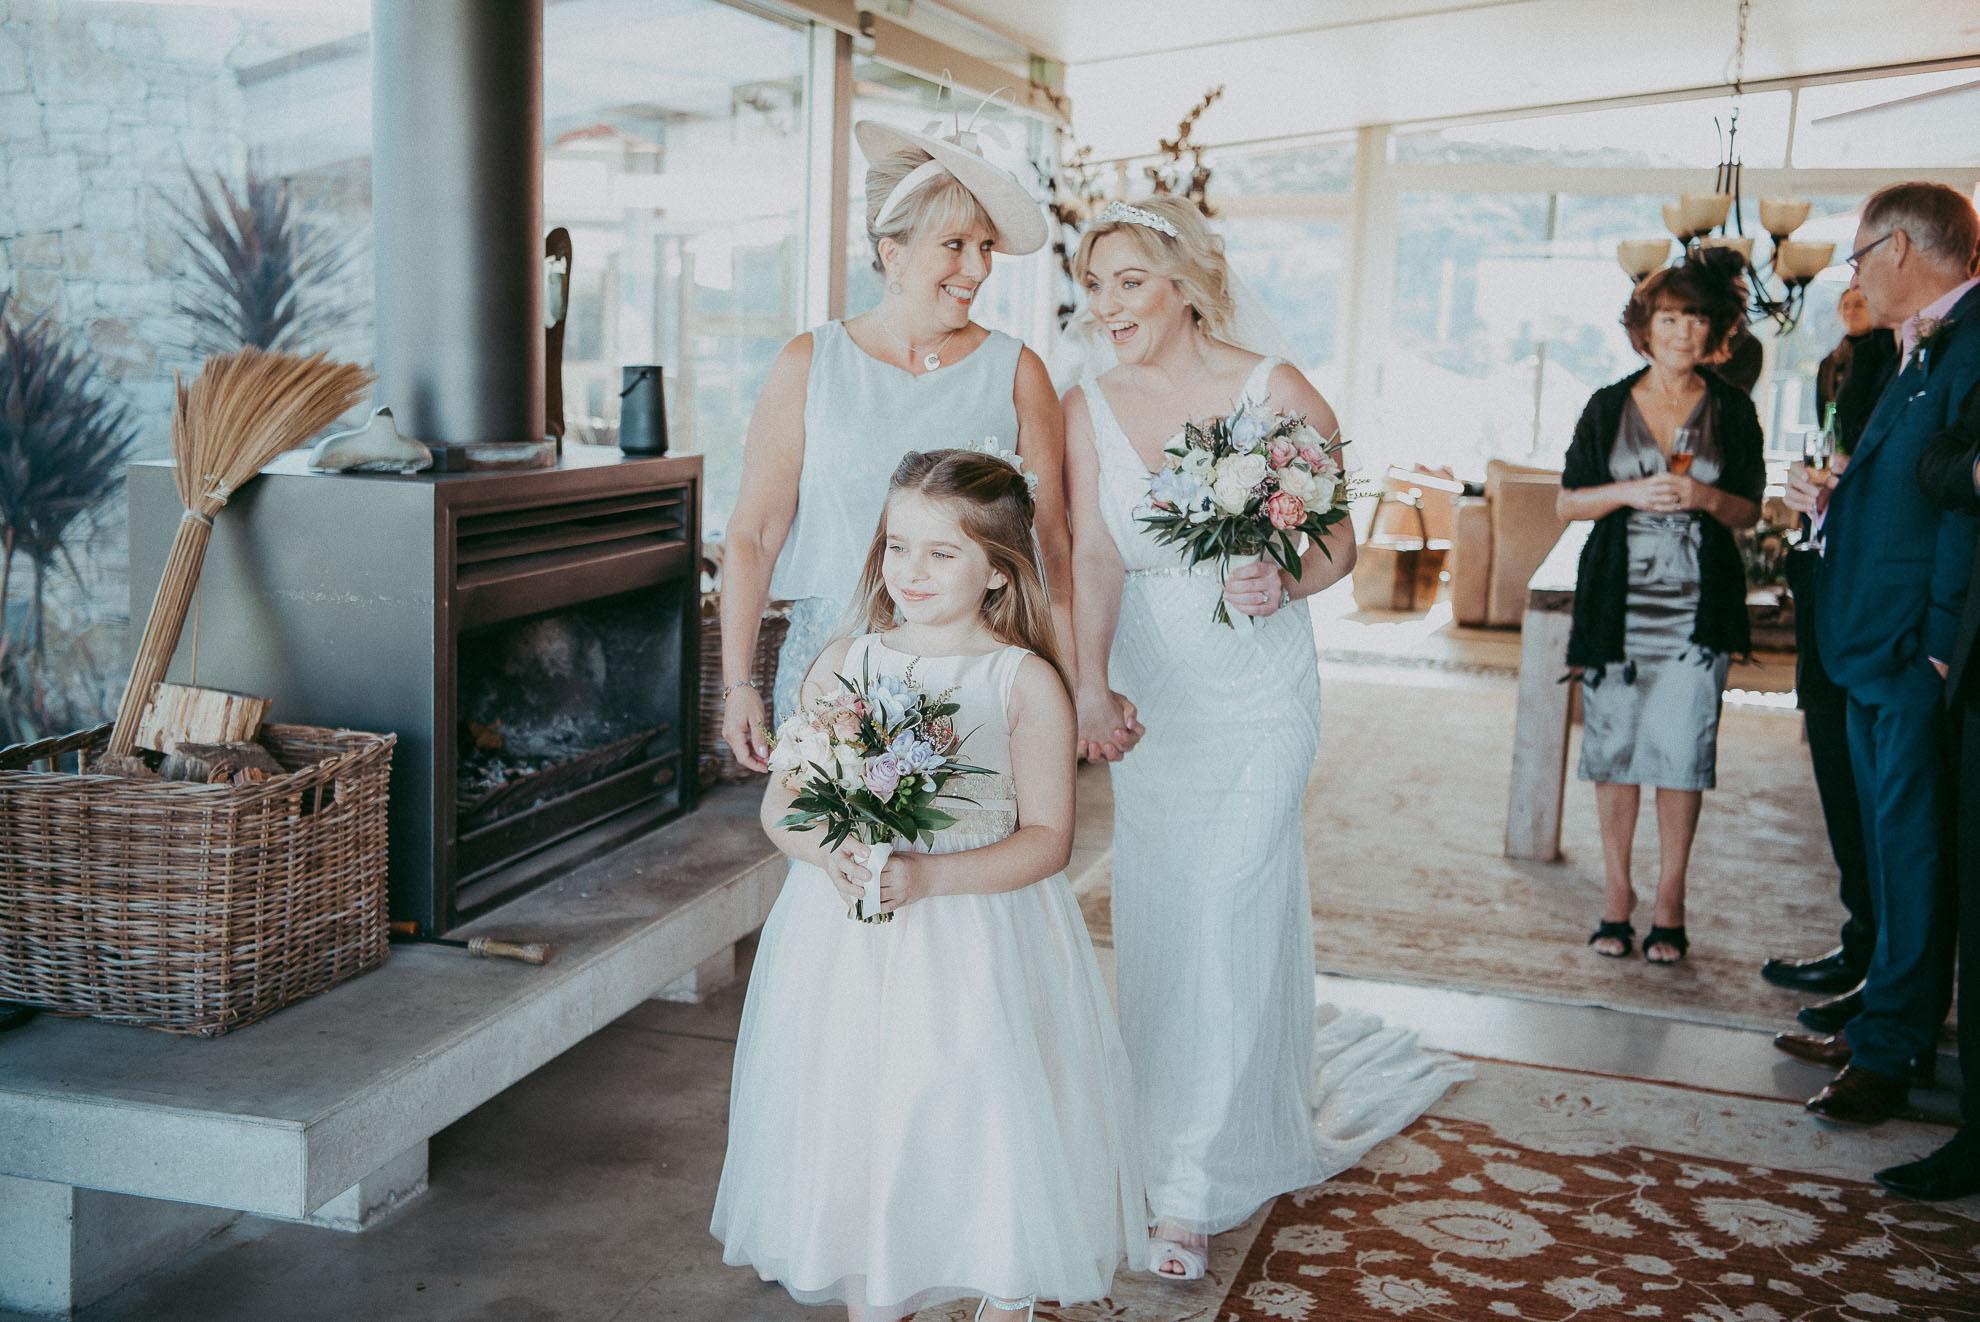 wedding-by-levien-141.JPG